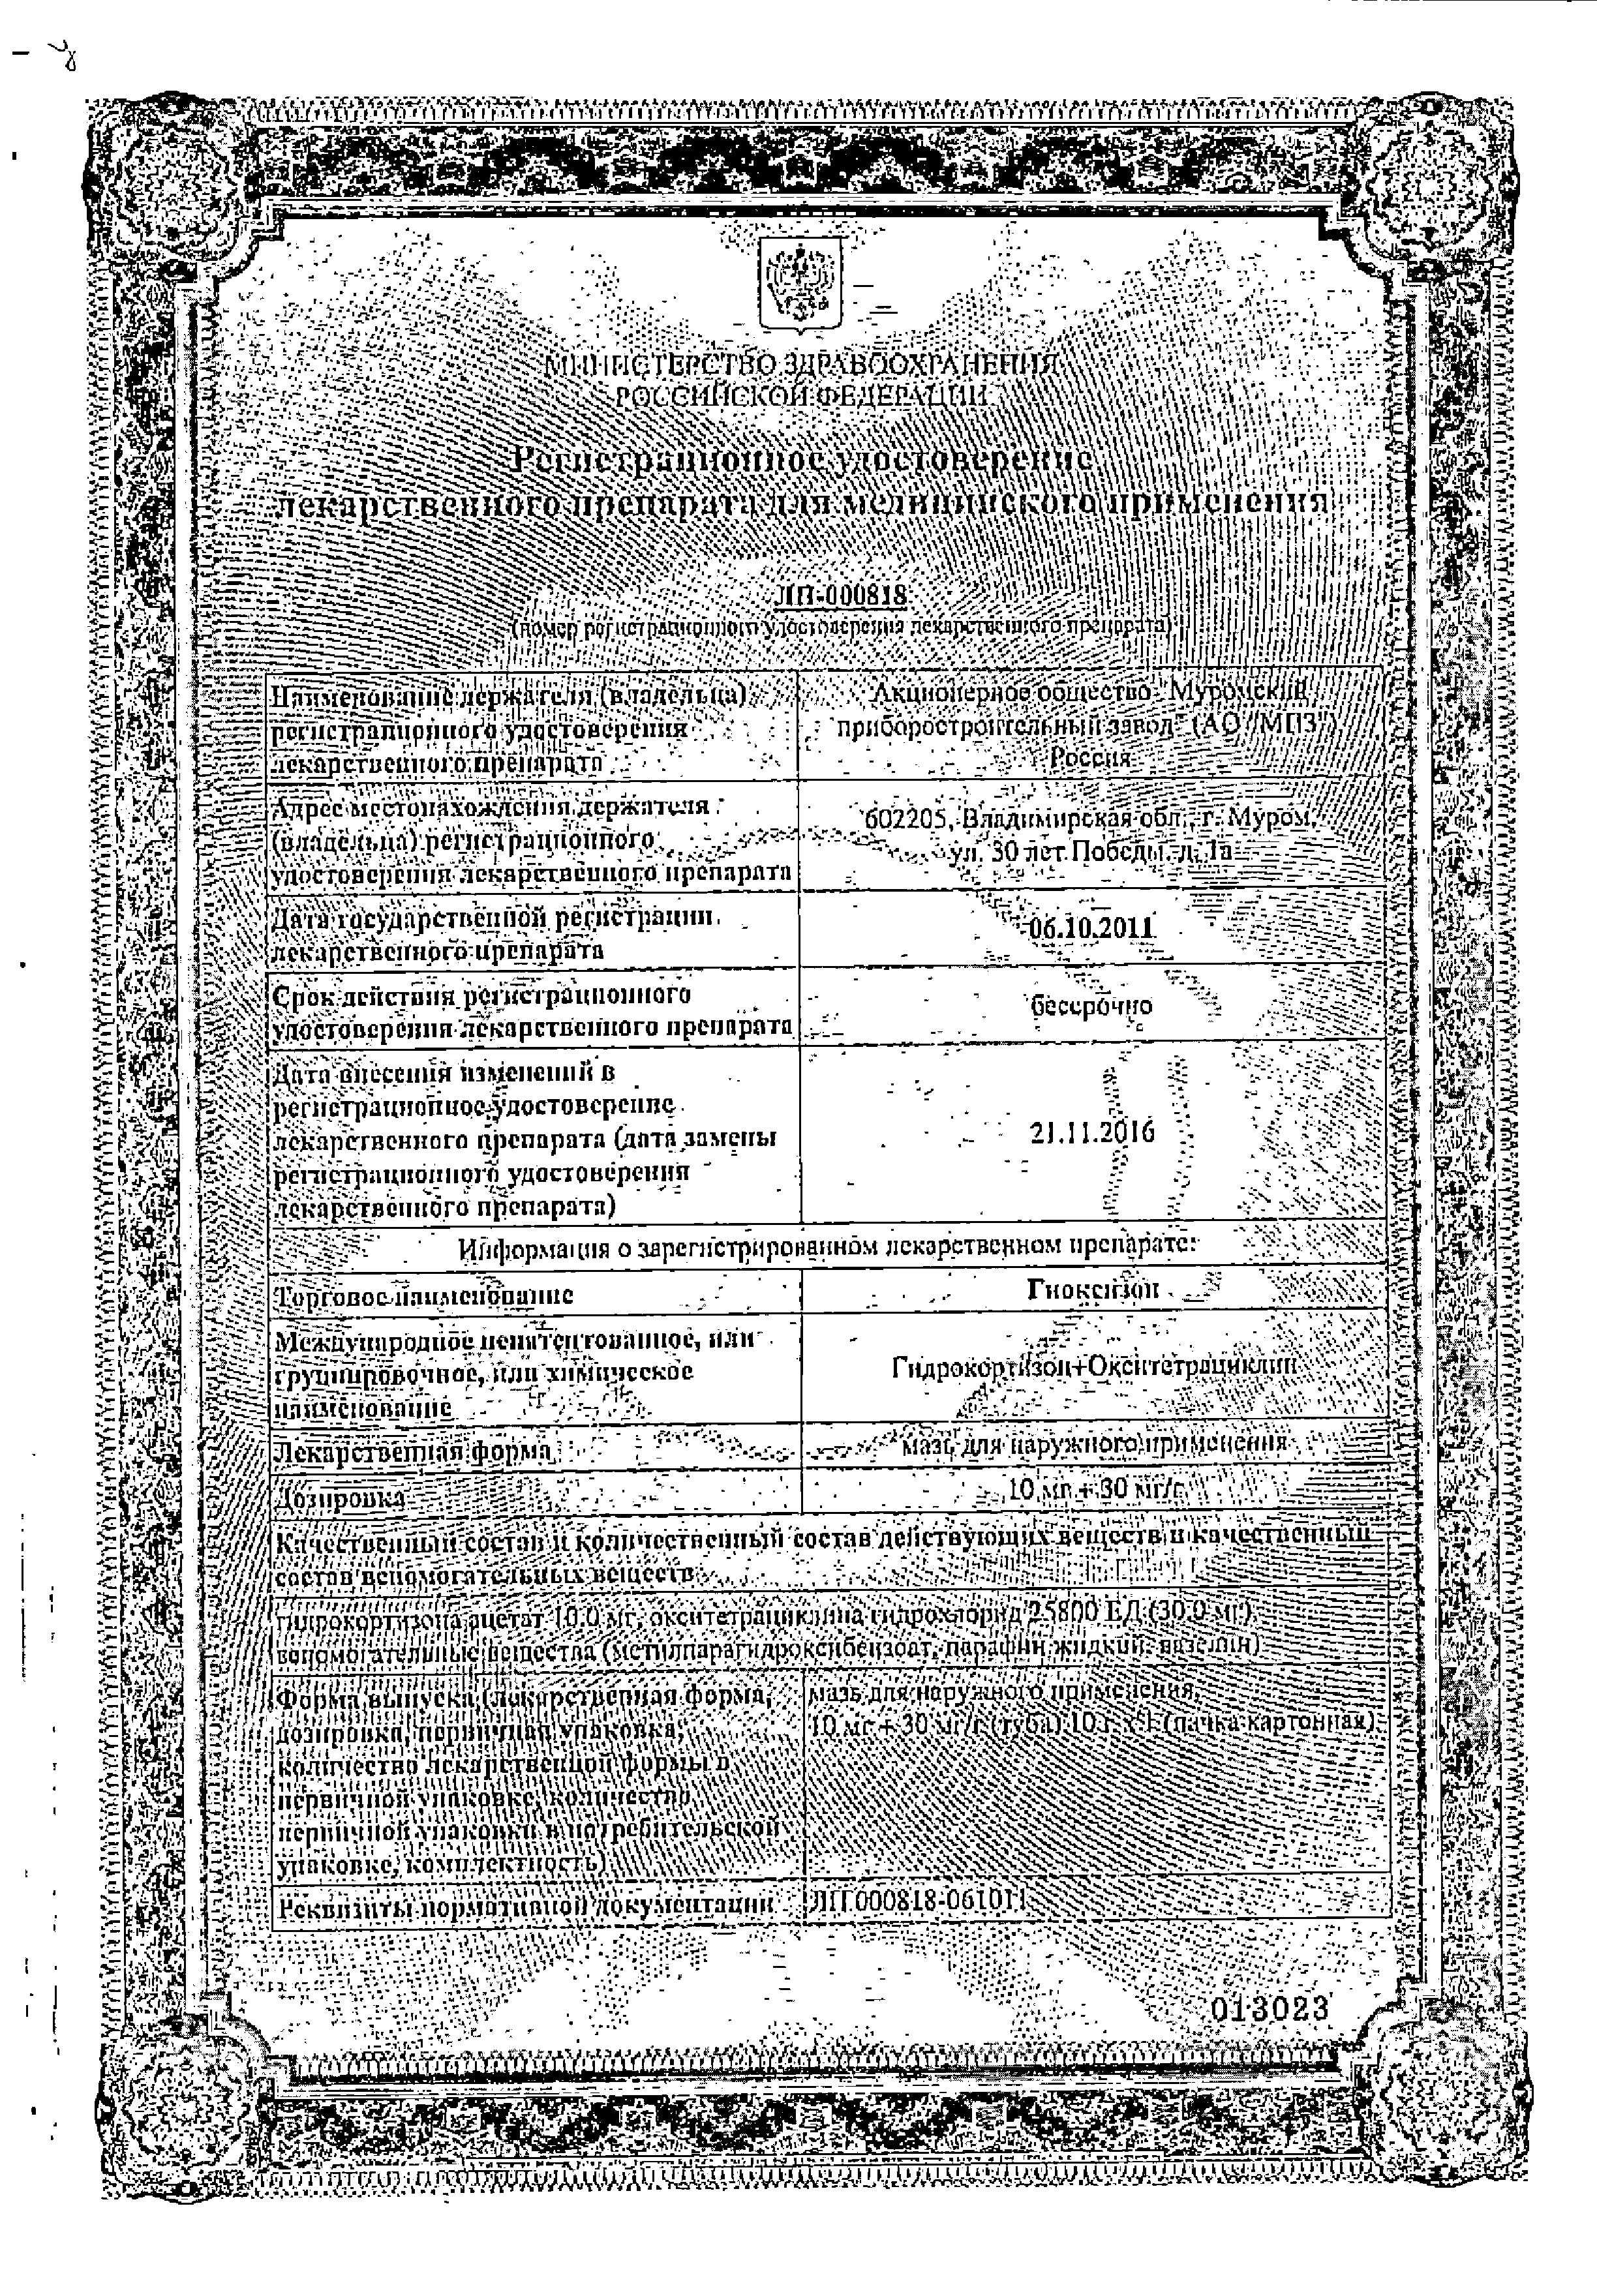 Гиоксизон сертификат